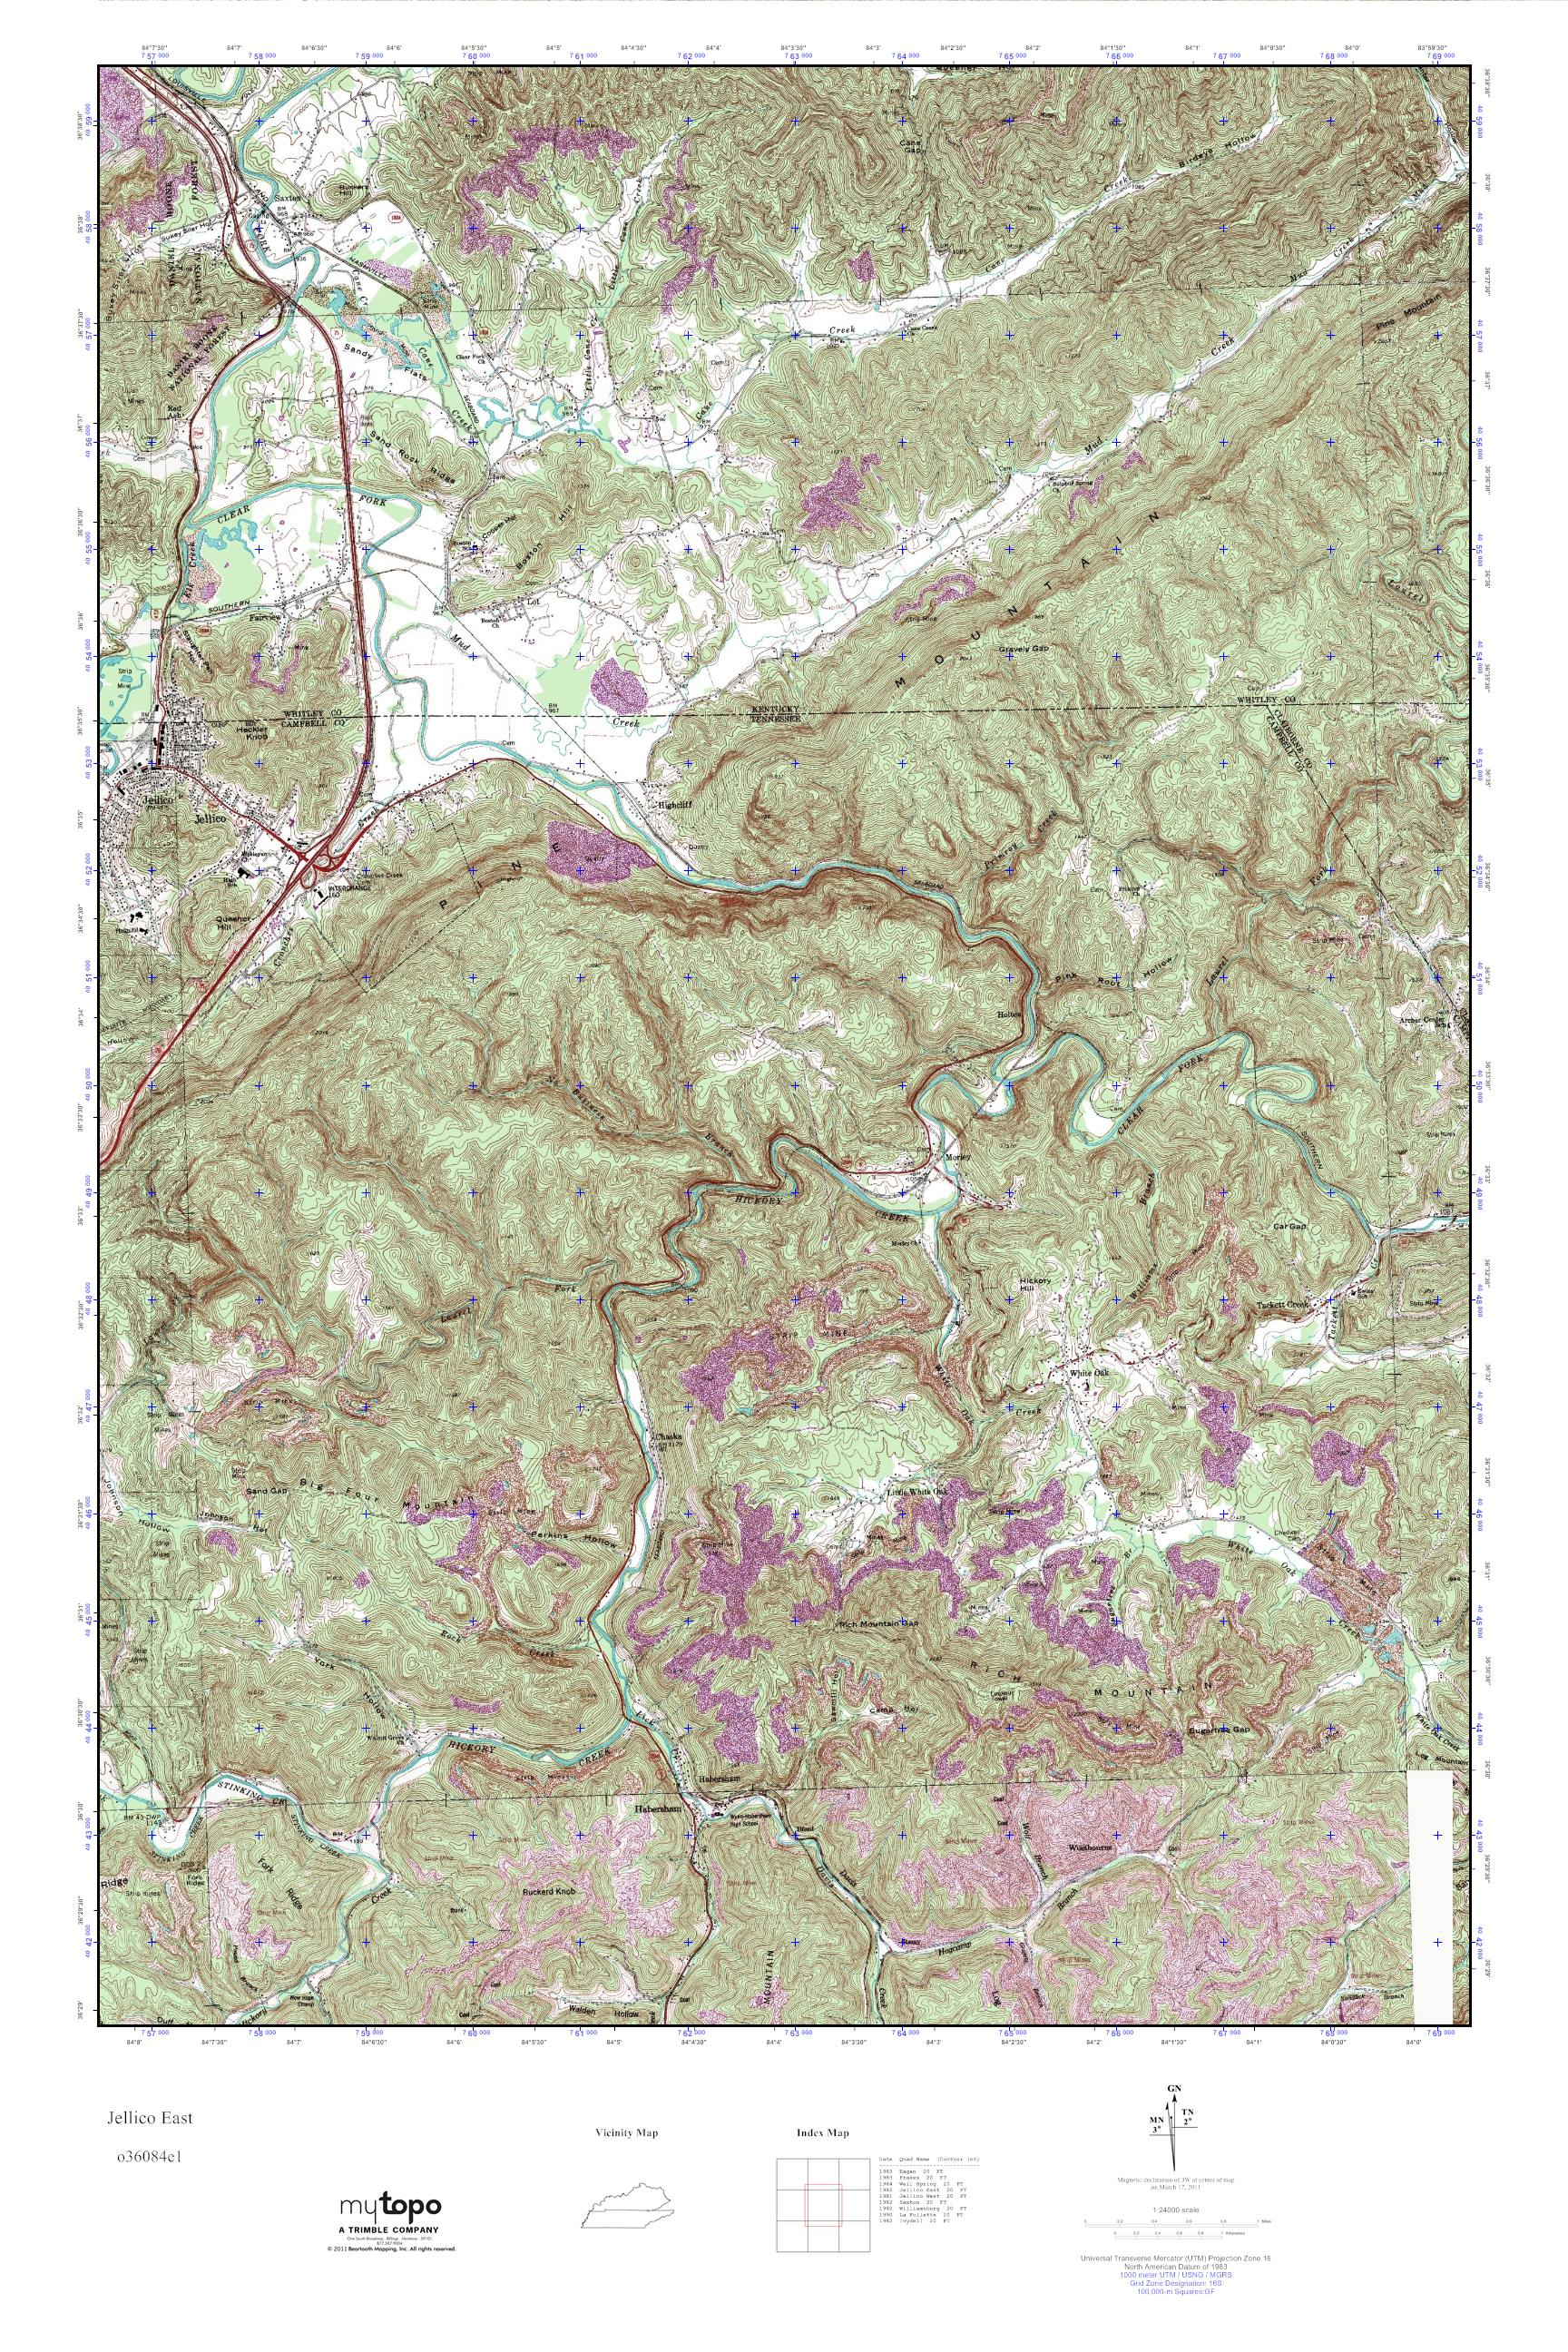 MyTopo Jellico East, Tennessee USGS Quad Topo Map